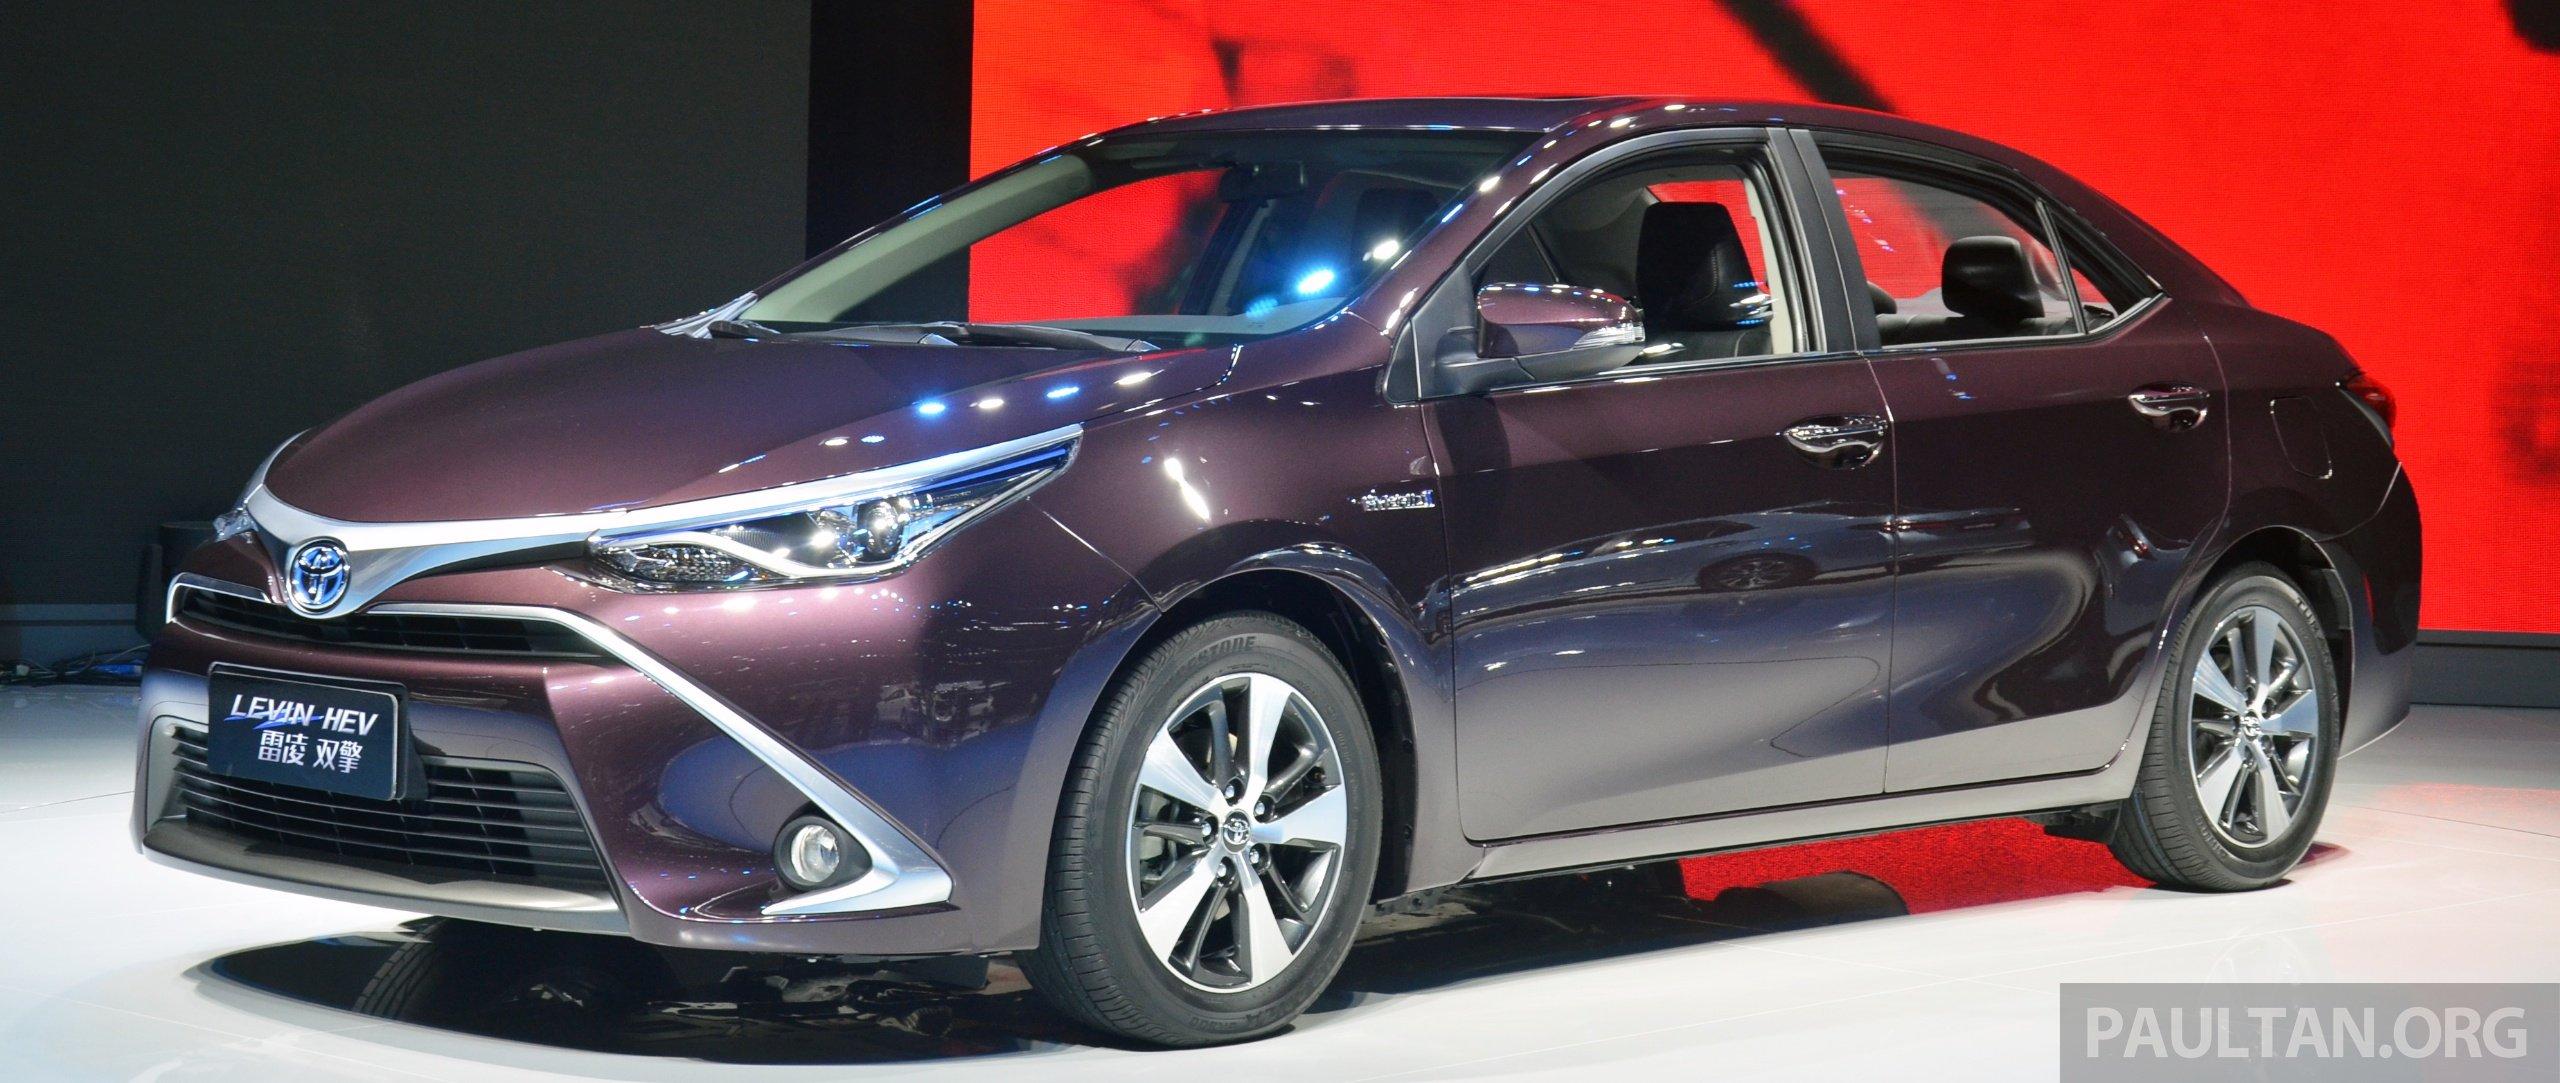 Shanghai 2015: Toyota Corolla Hybrid/Levin HEV debut Paul ...